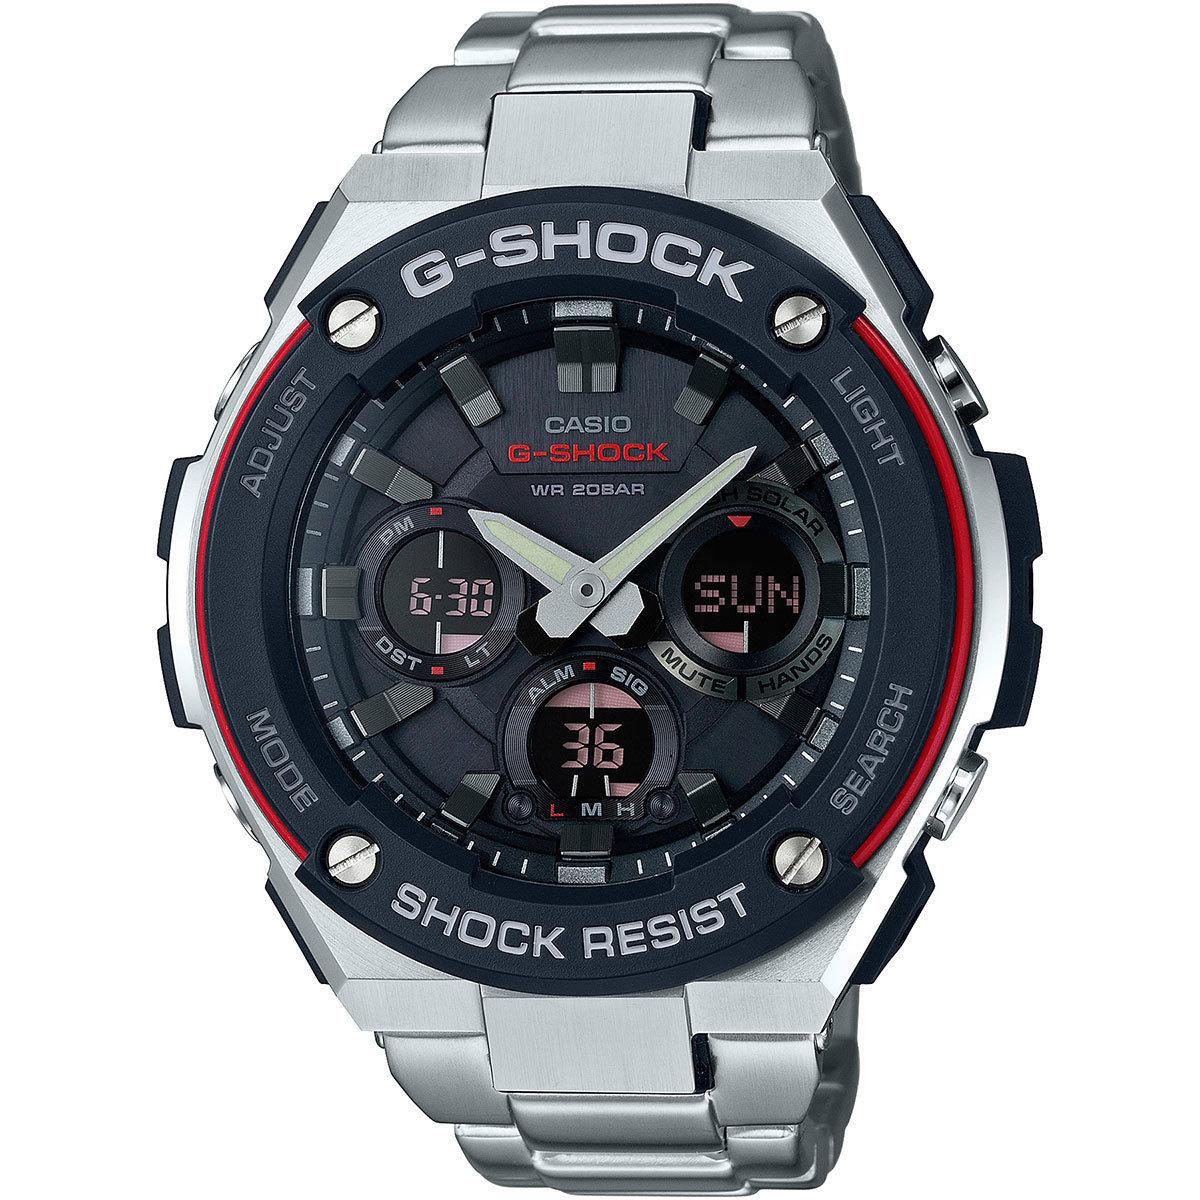 reloj hombre Casio G-SHOCK G-Steel Men's GSTS100D-1A4 Tough Solar Super Illuminator